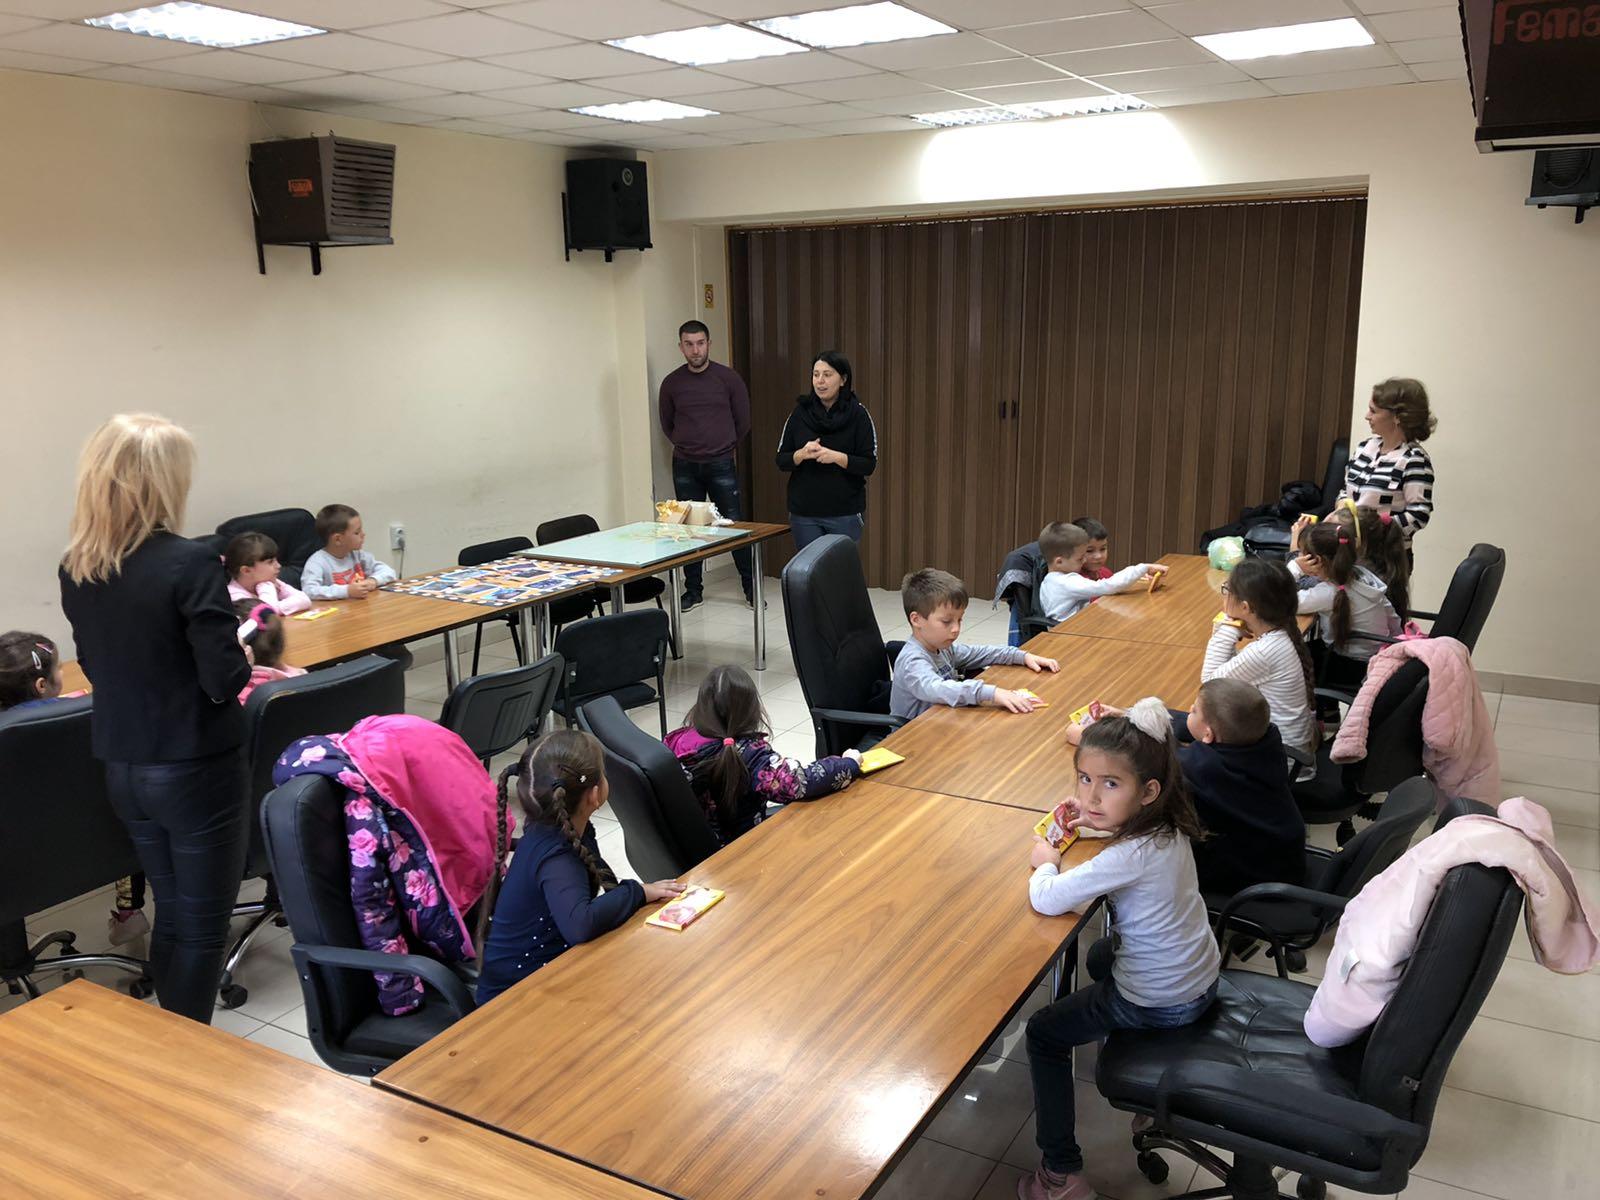 Deca i predsednica opštine, foto: D.M.